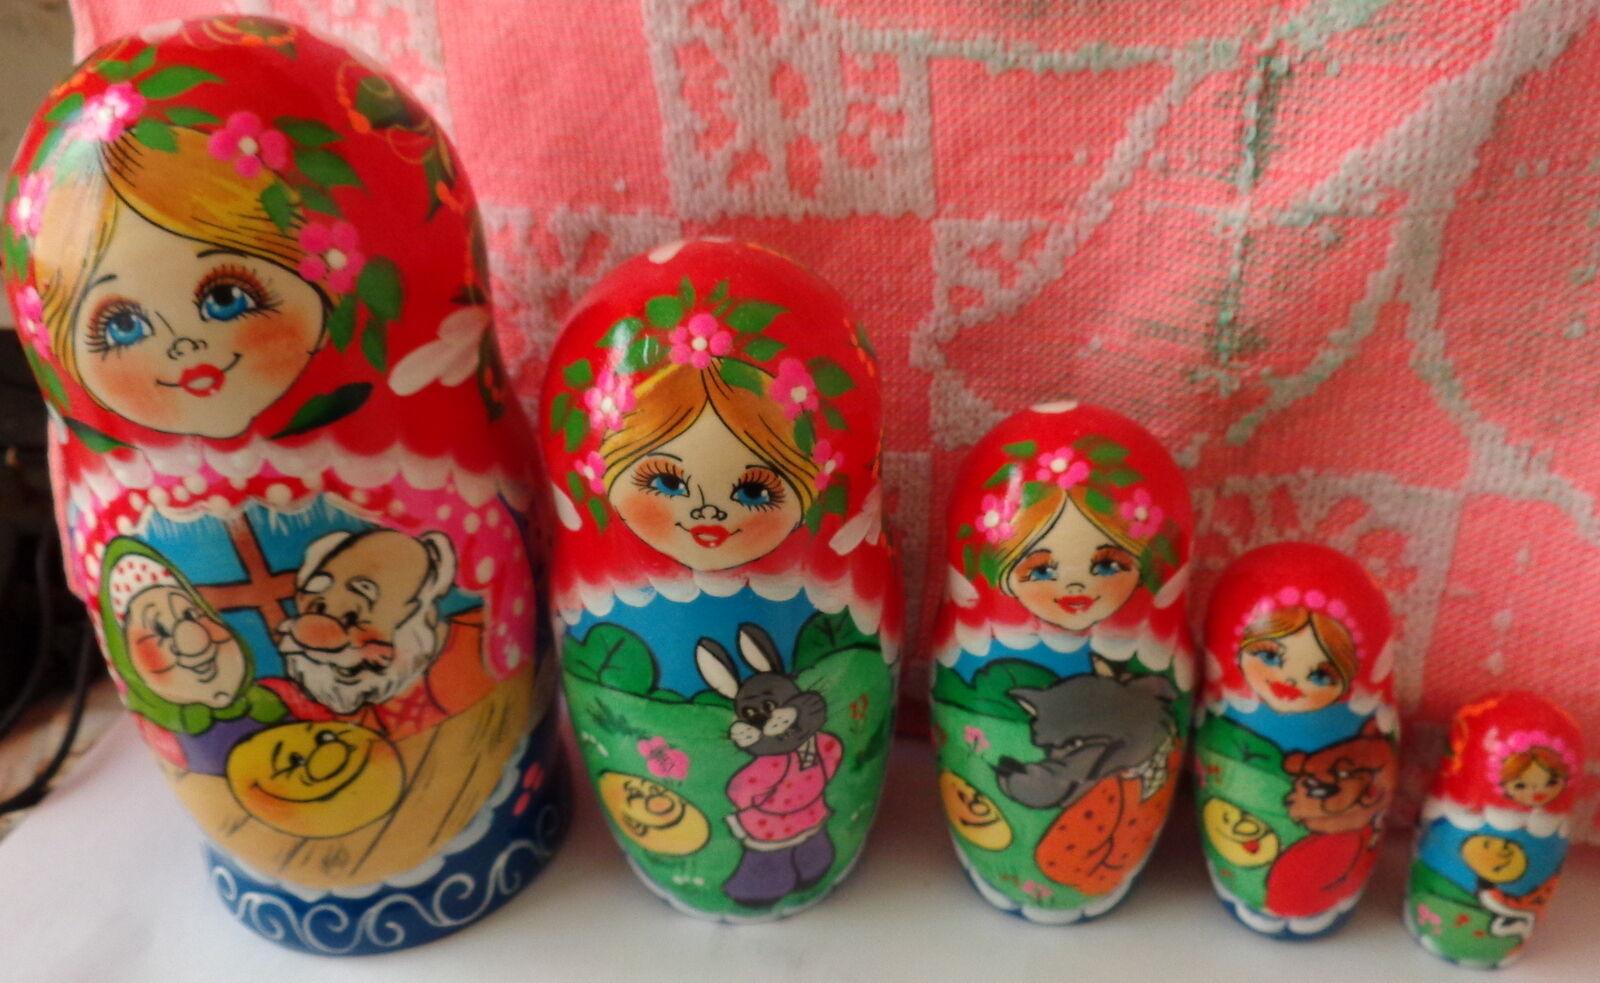 Superb quality fairy tale 'The Bun ' RUSSIAN NESTING DOLL 5 PCS  LARGE 6.8  5S